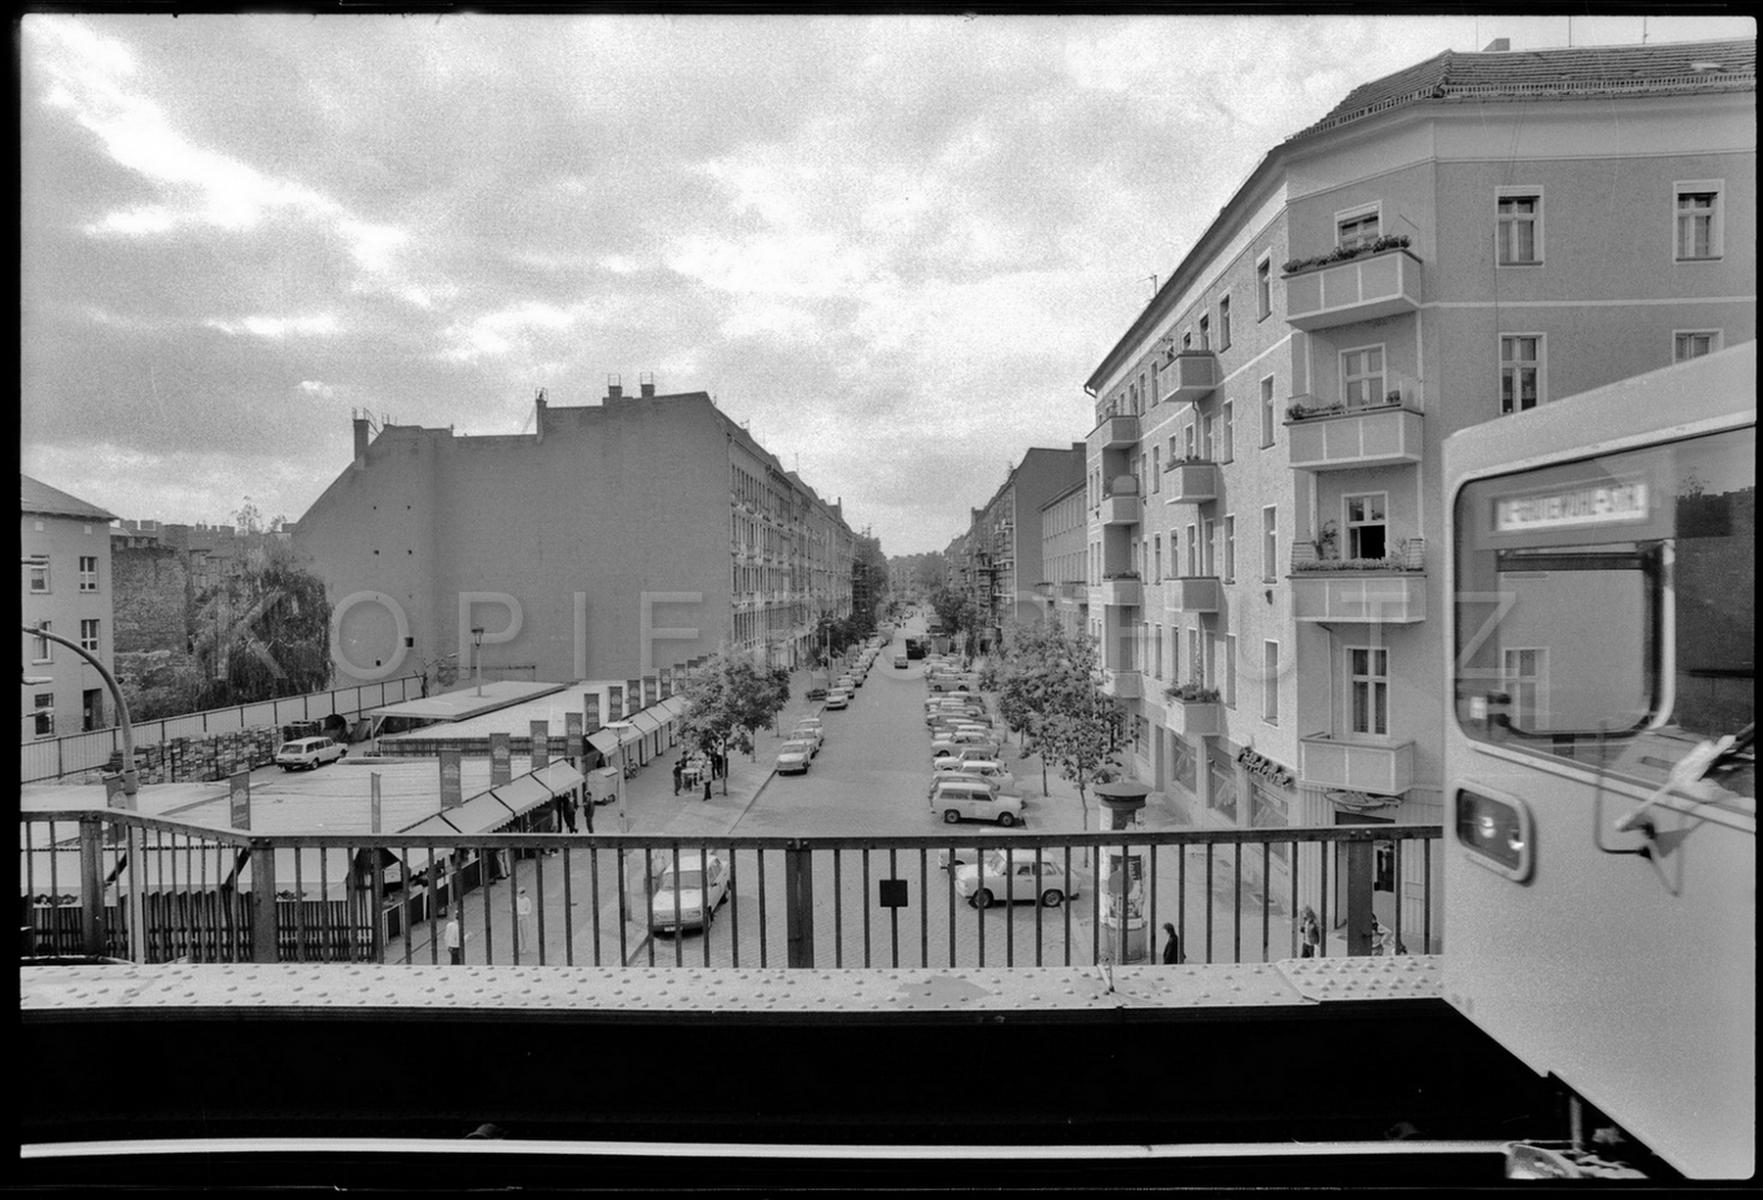 Nr02-038_Kopenhagenerstraße -17.9.1990